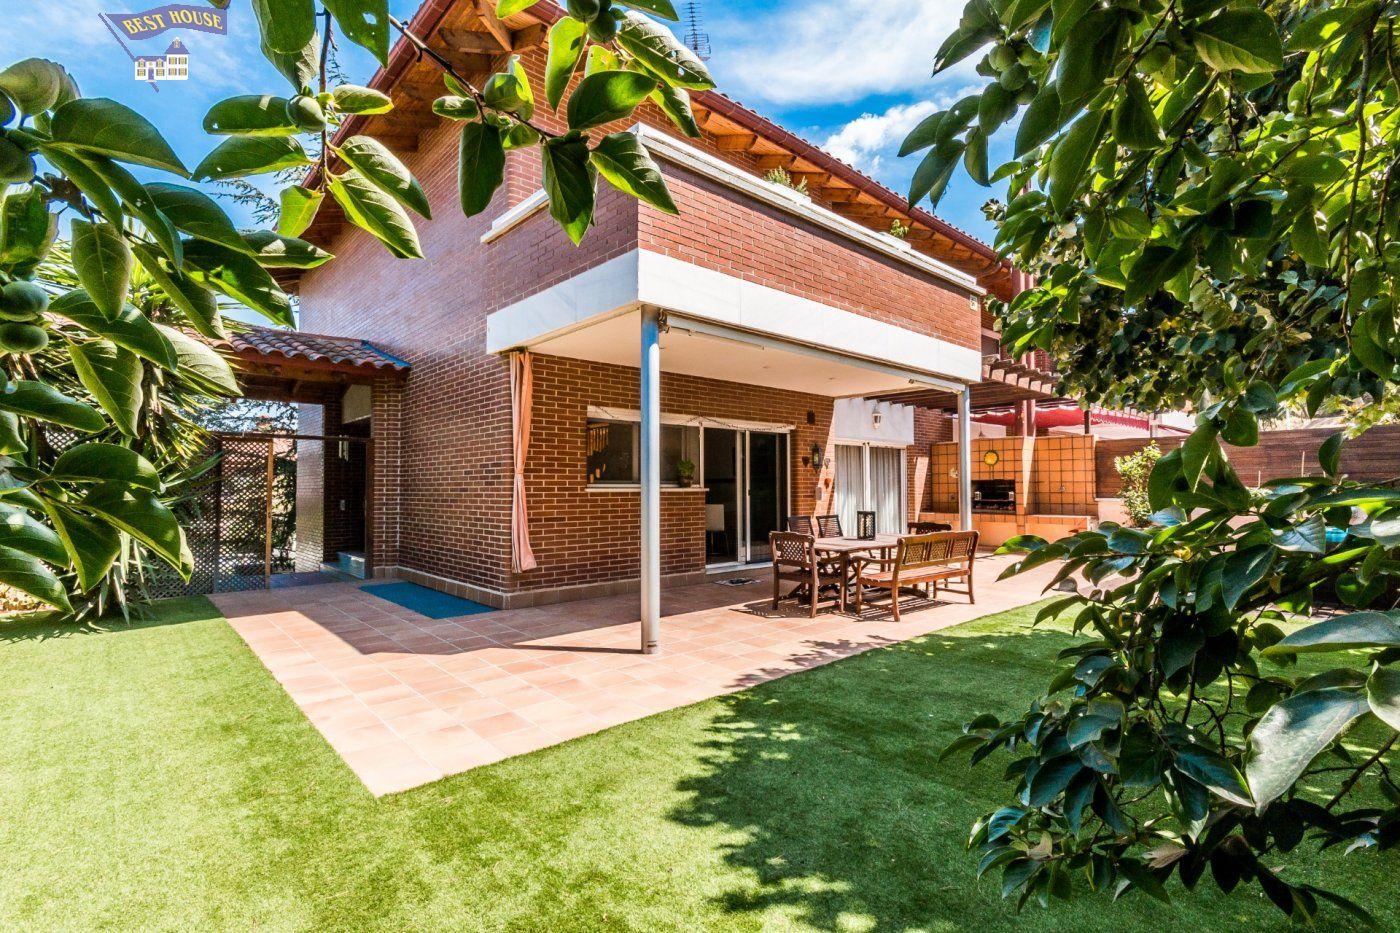 Casa en venta en Montcada i Reixac